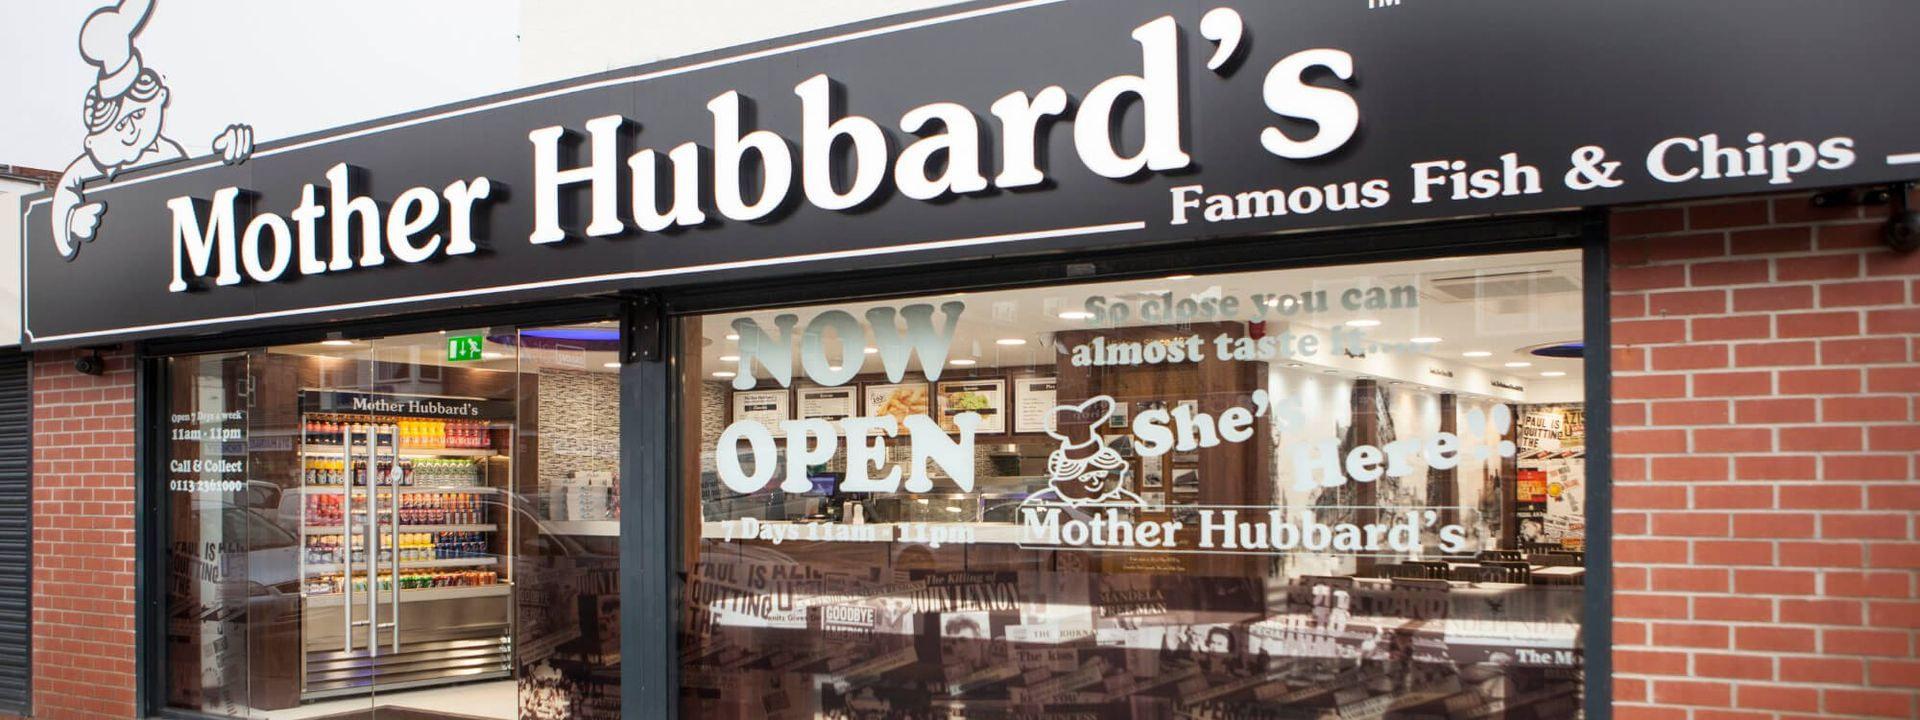 Moher Hubbard's Fish and Chips Harehills